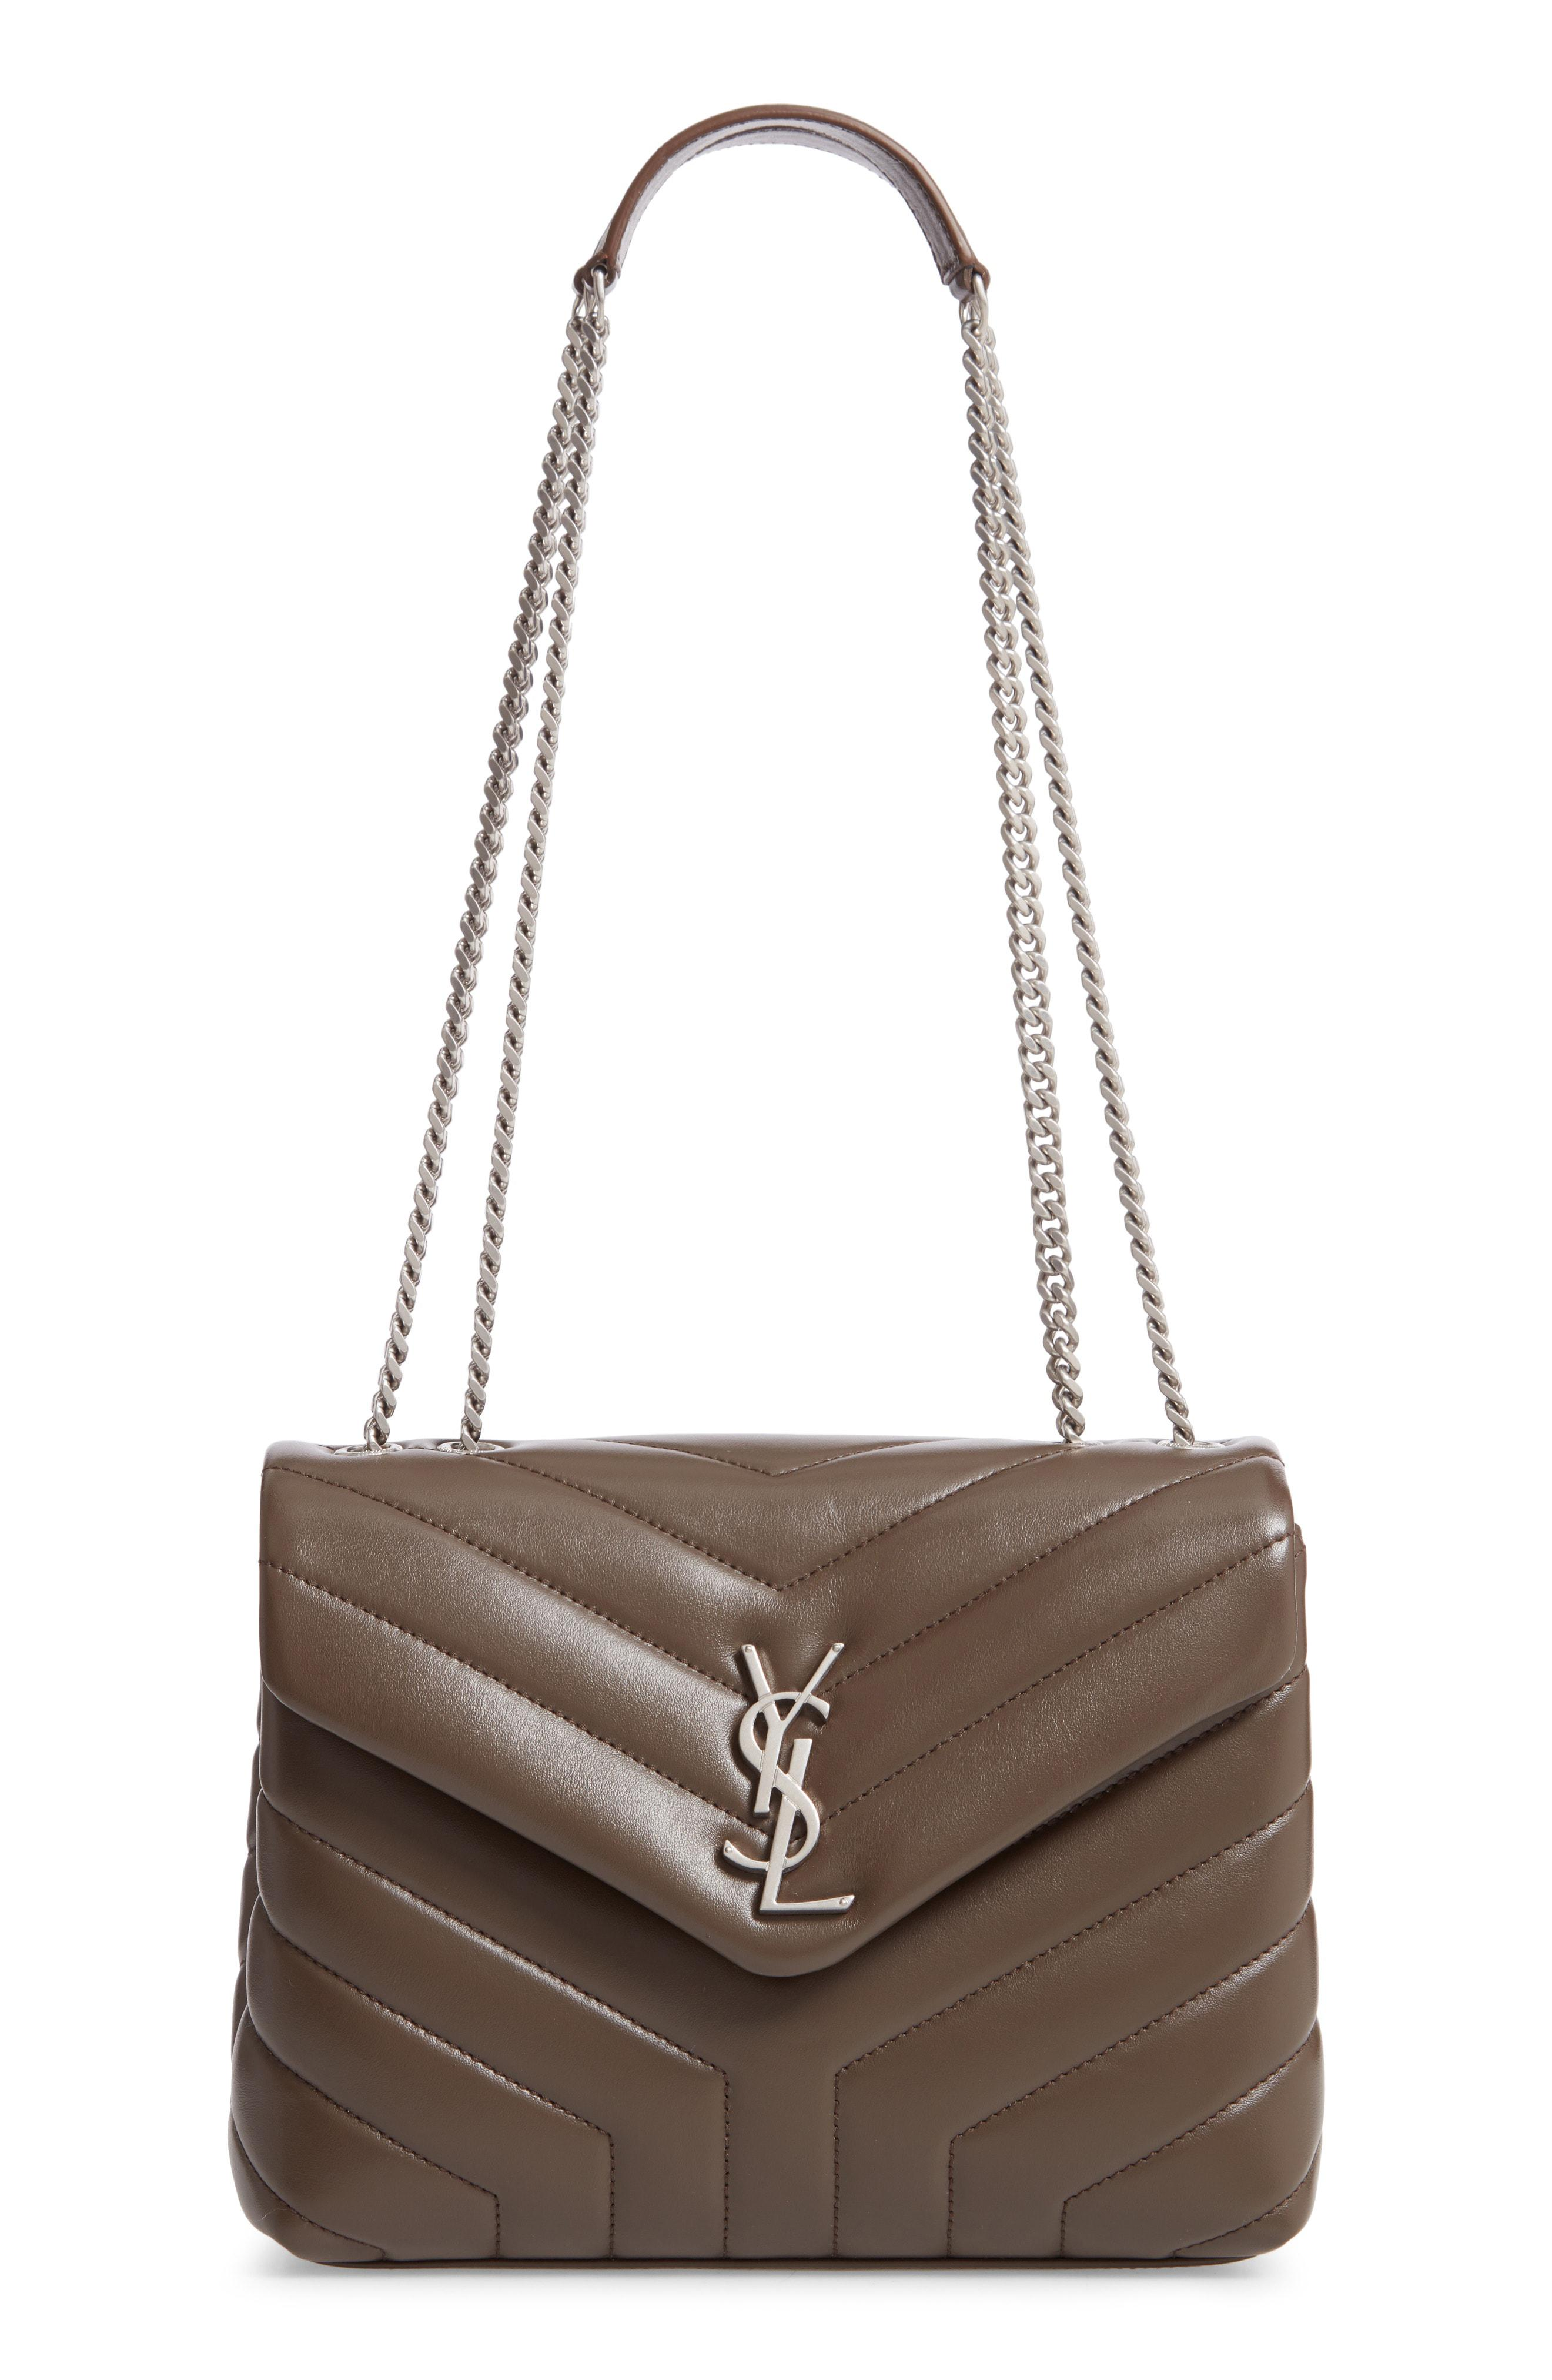 02b464e31140c Saint Laurent. Women's Small Loulou Matelasse Leather Shoulder Bag